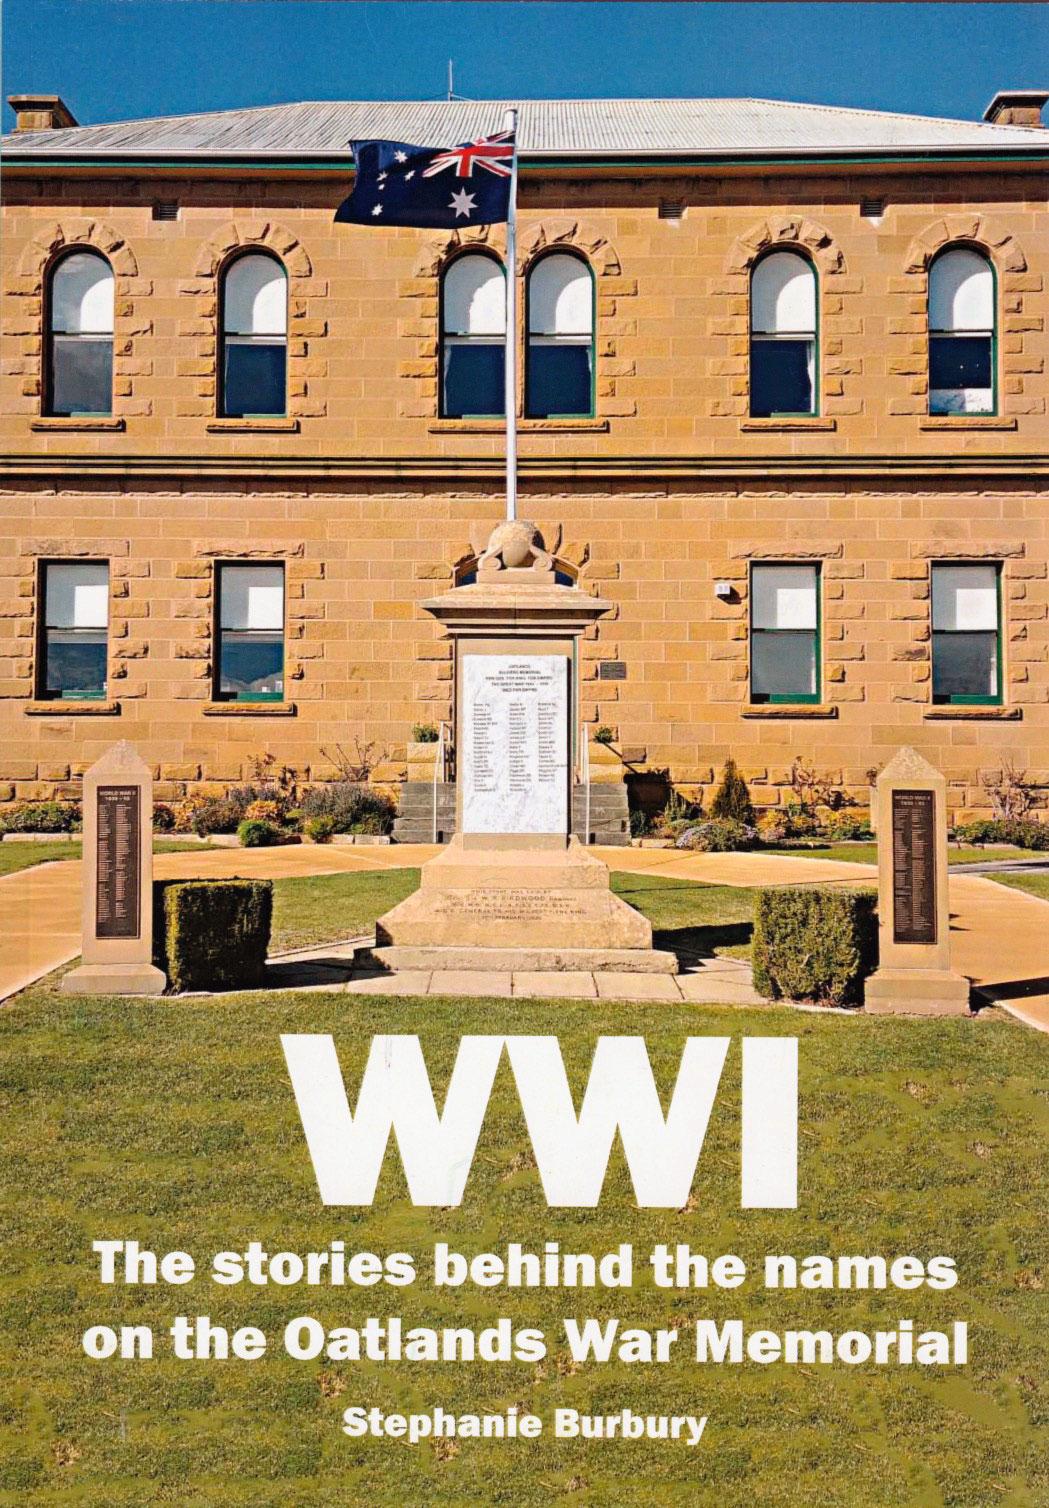 Stories Behind the Names on the Oatlands War Memorial